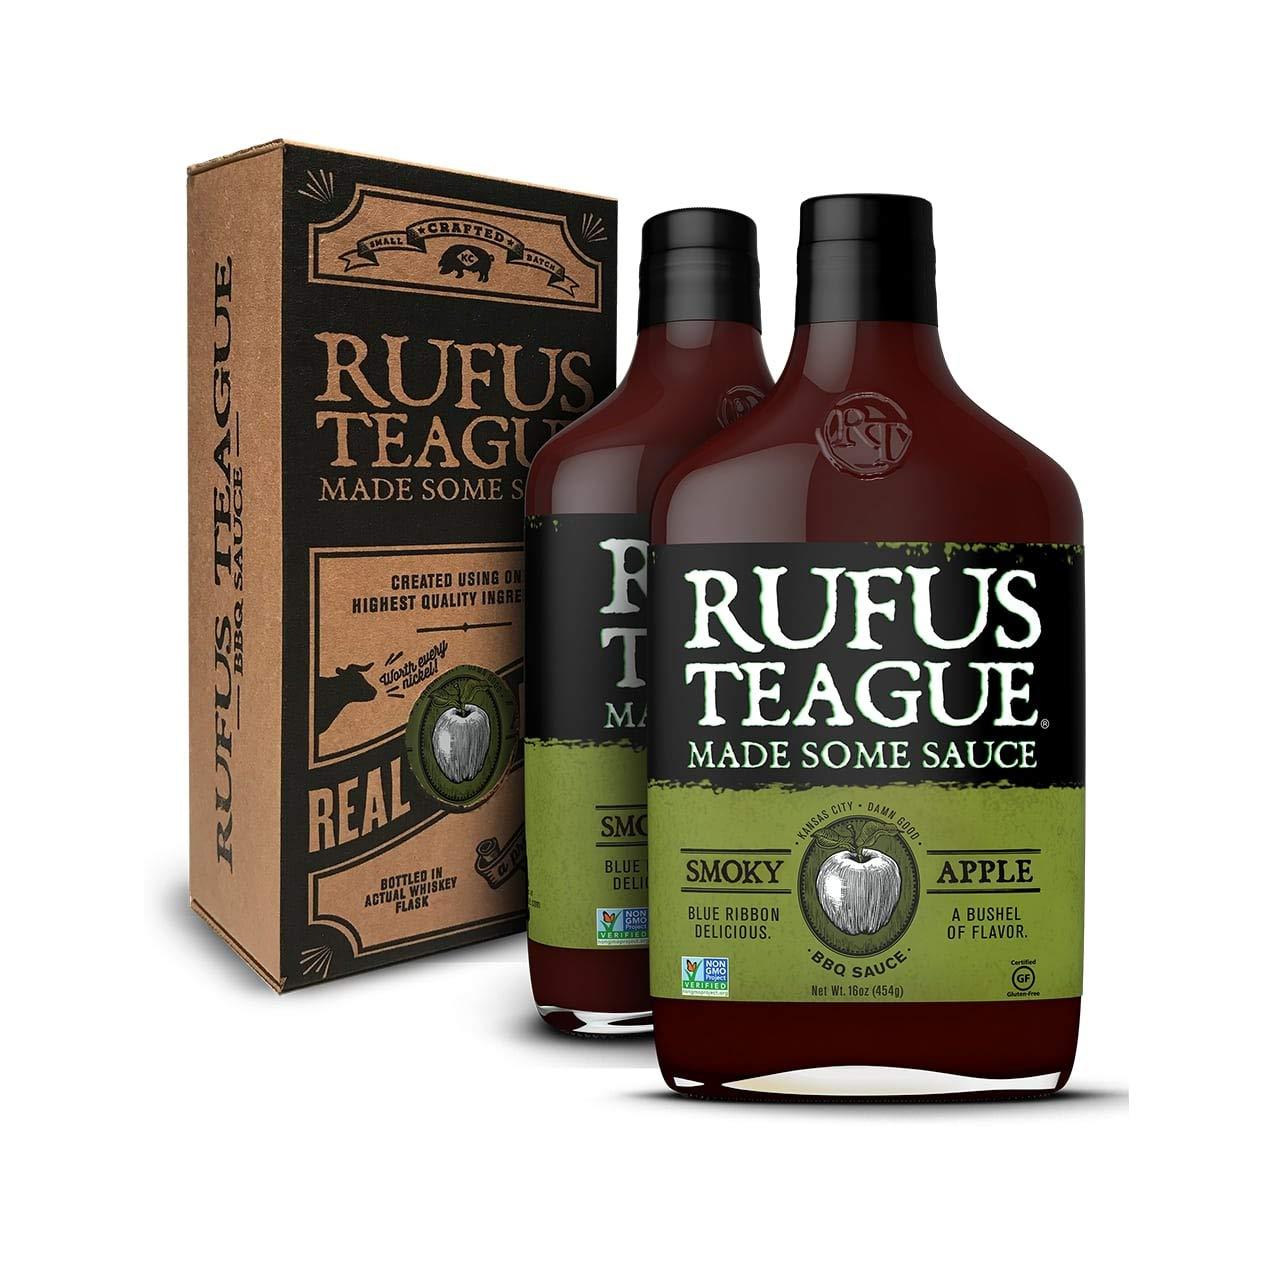 Rufus Teague - Smoky Apple BBQ Sauce - Premium Barbecue Sauce - 16 oz. Bottles - 2 Pack